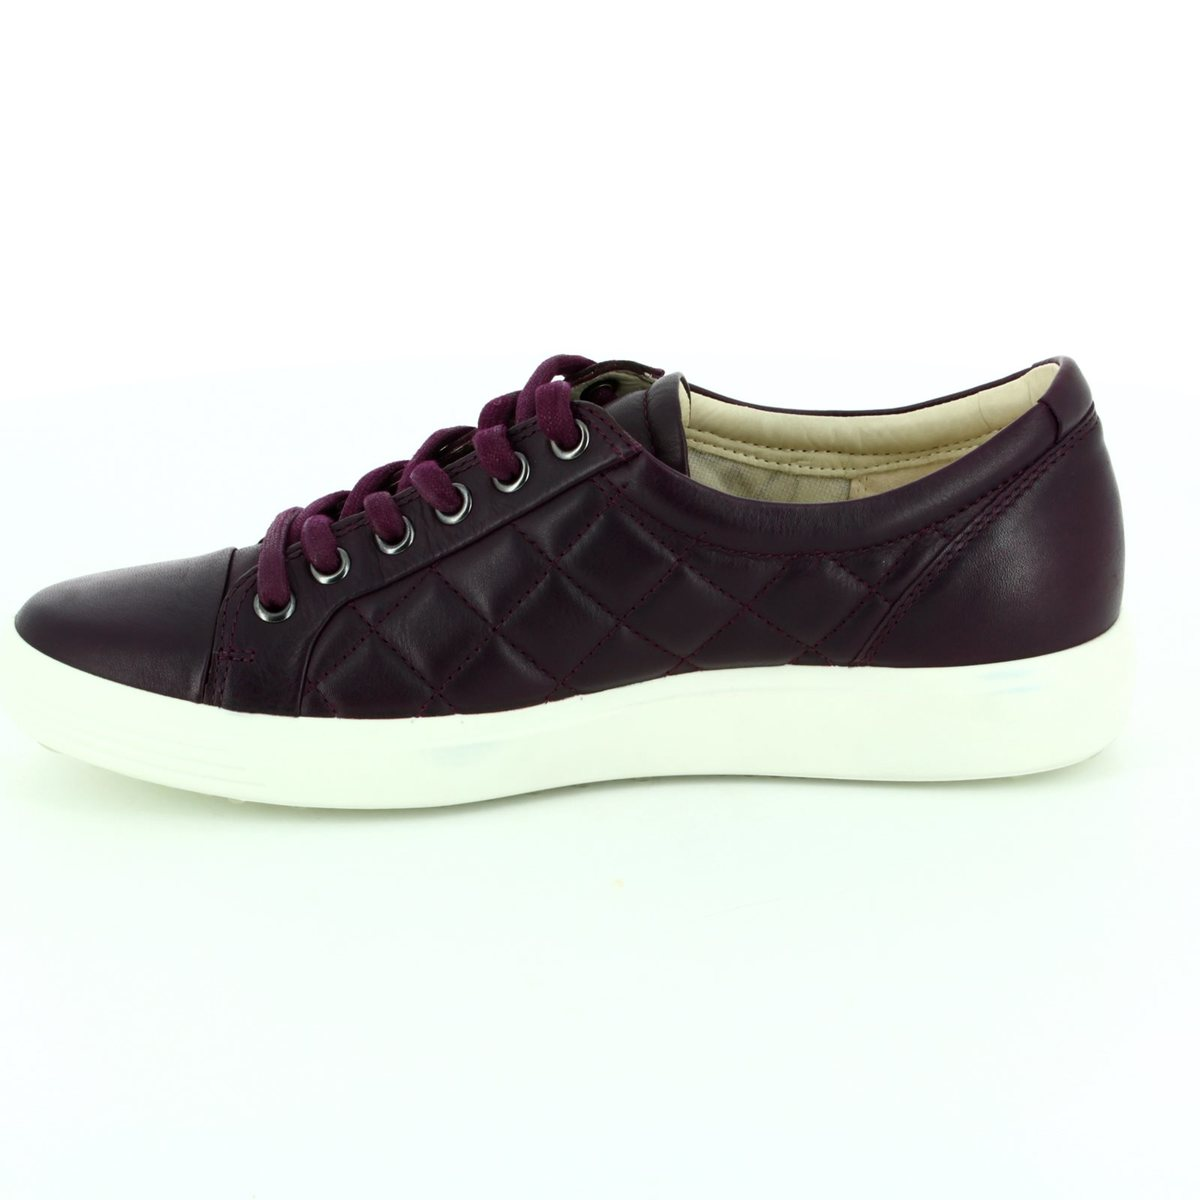 ecco soft 7 ladies 430083 01276 purple lacing shoes. Black Bedroom Furniture Sets. Home Design Ideas